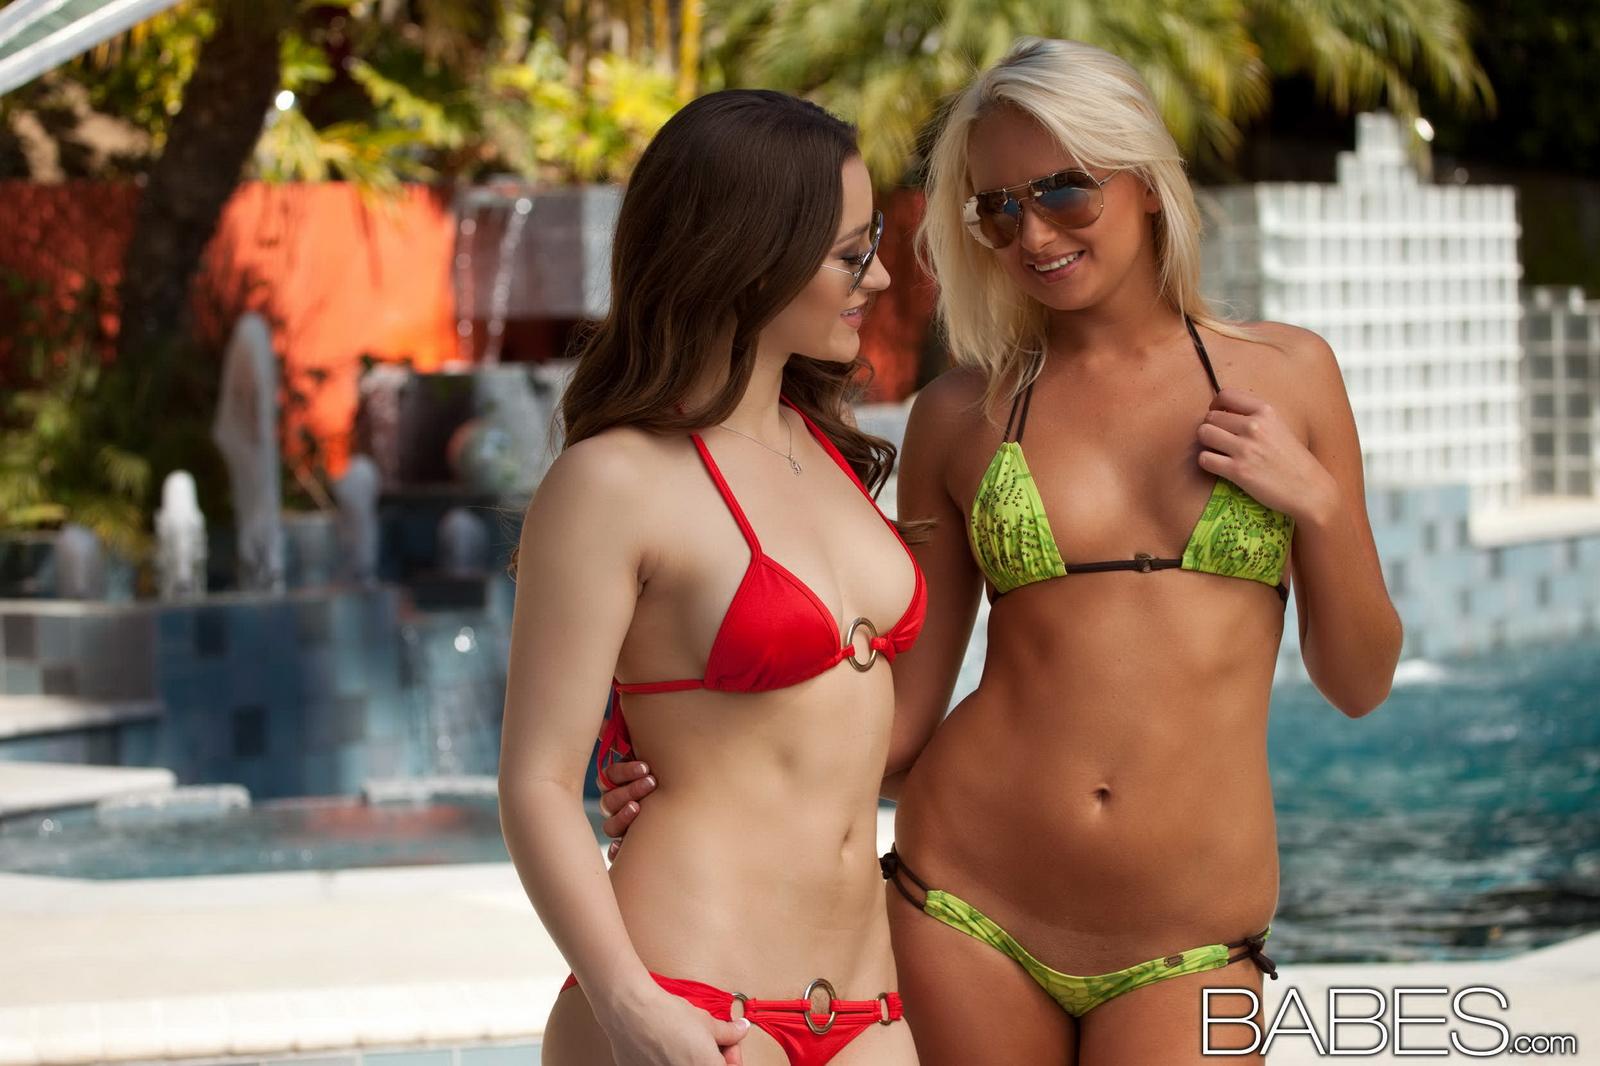 Teen girls lesbian babes in bikinis africans